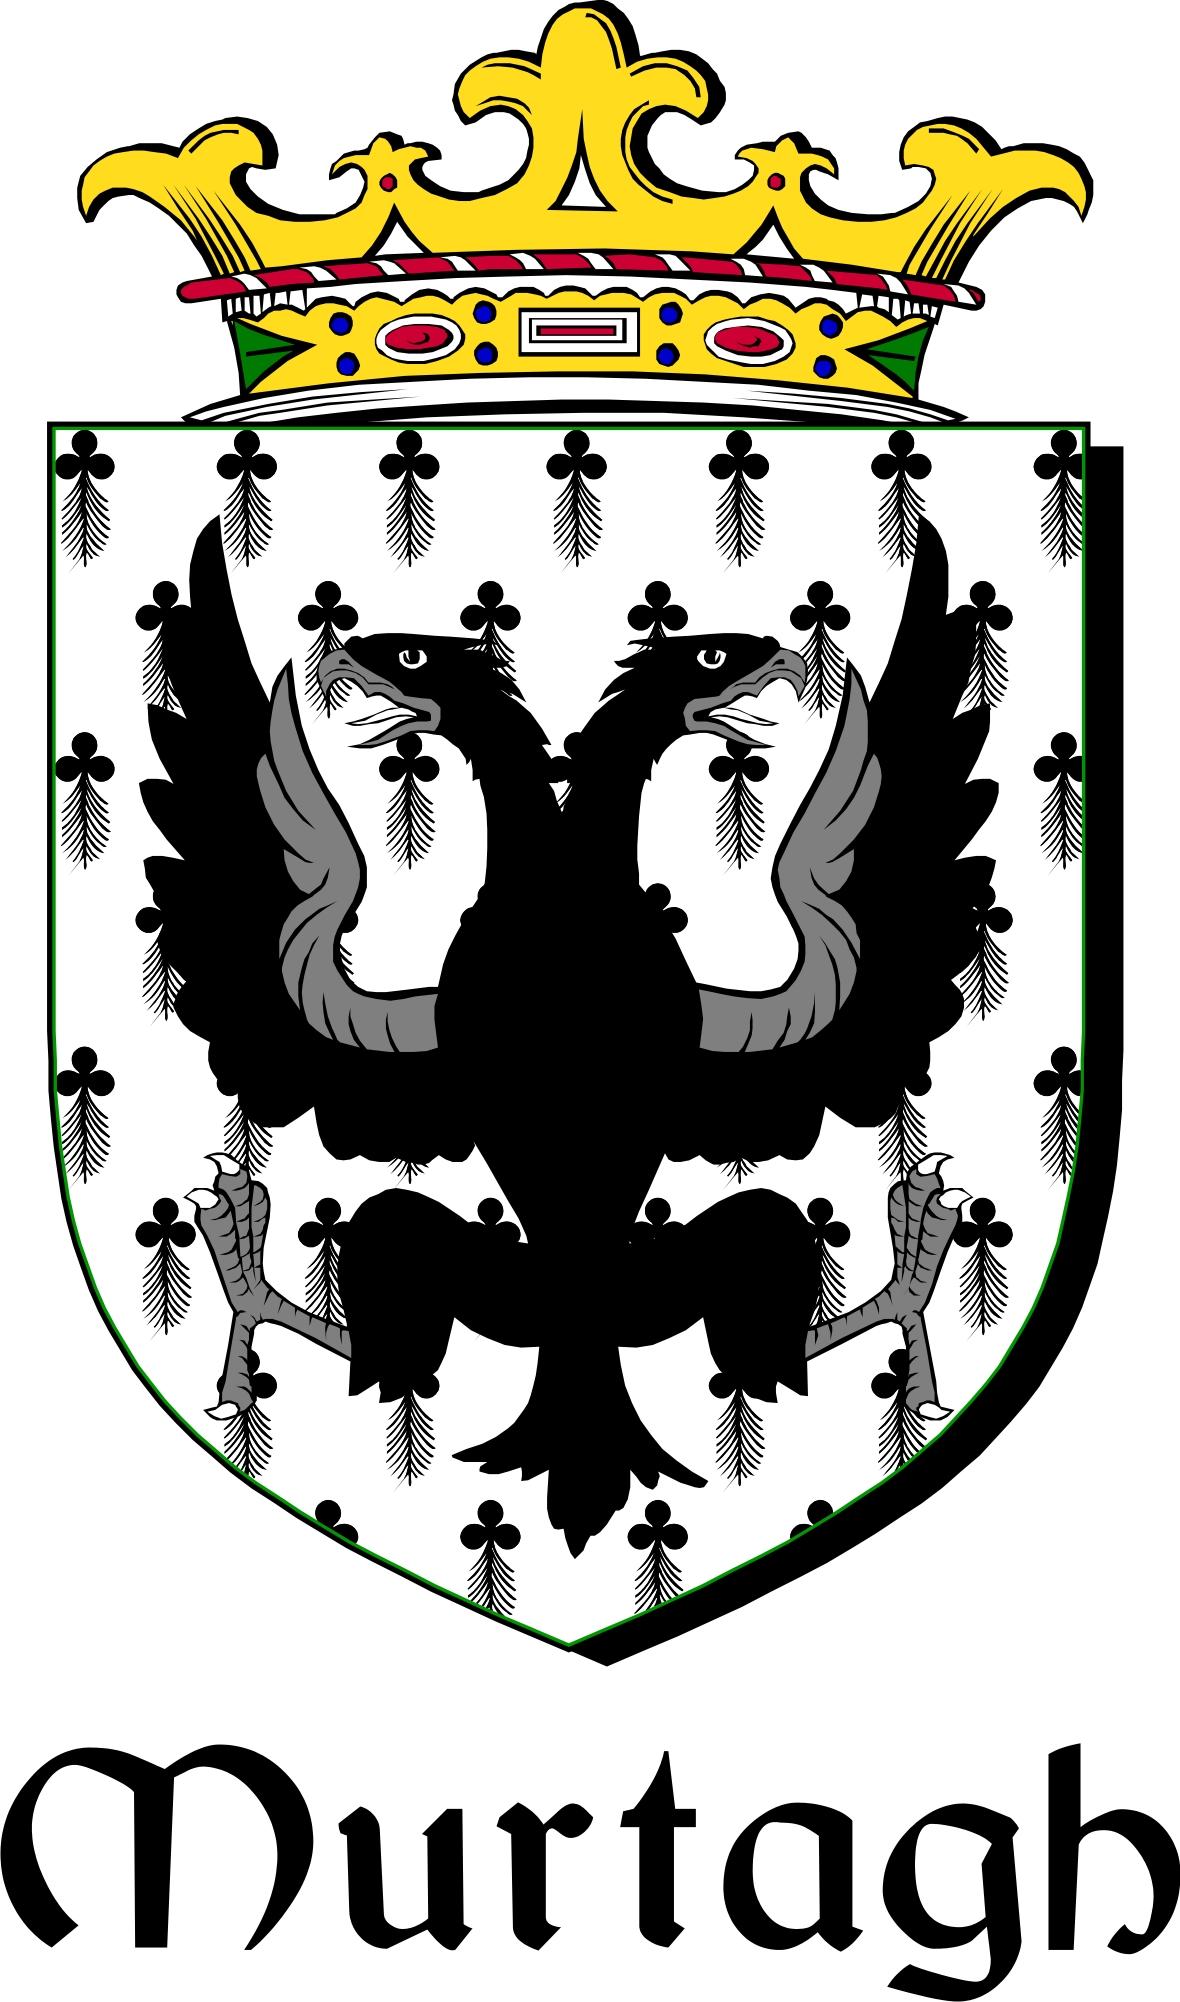 Murtagh family crest irish coat of arms image download murtagh murtagh family crest irish coat of arms image download buycottarizona Images